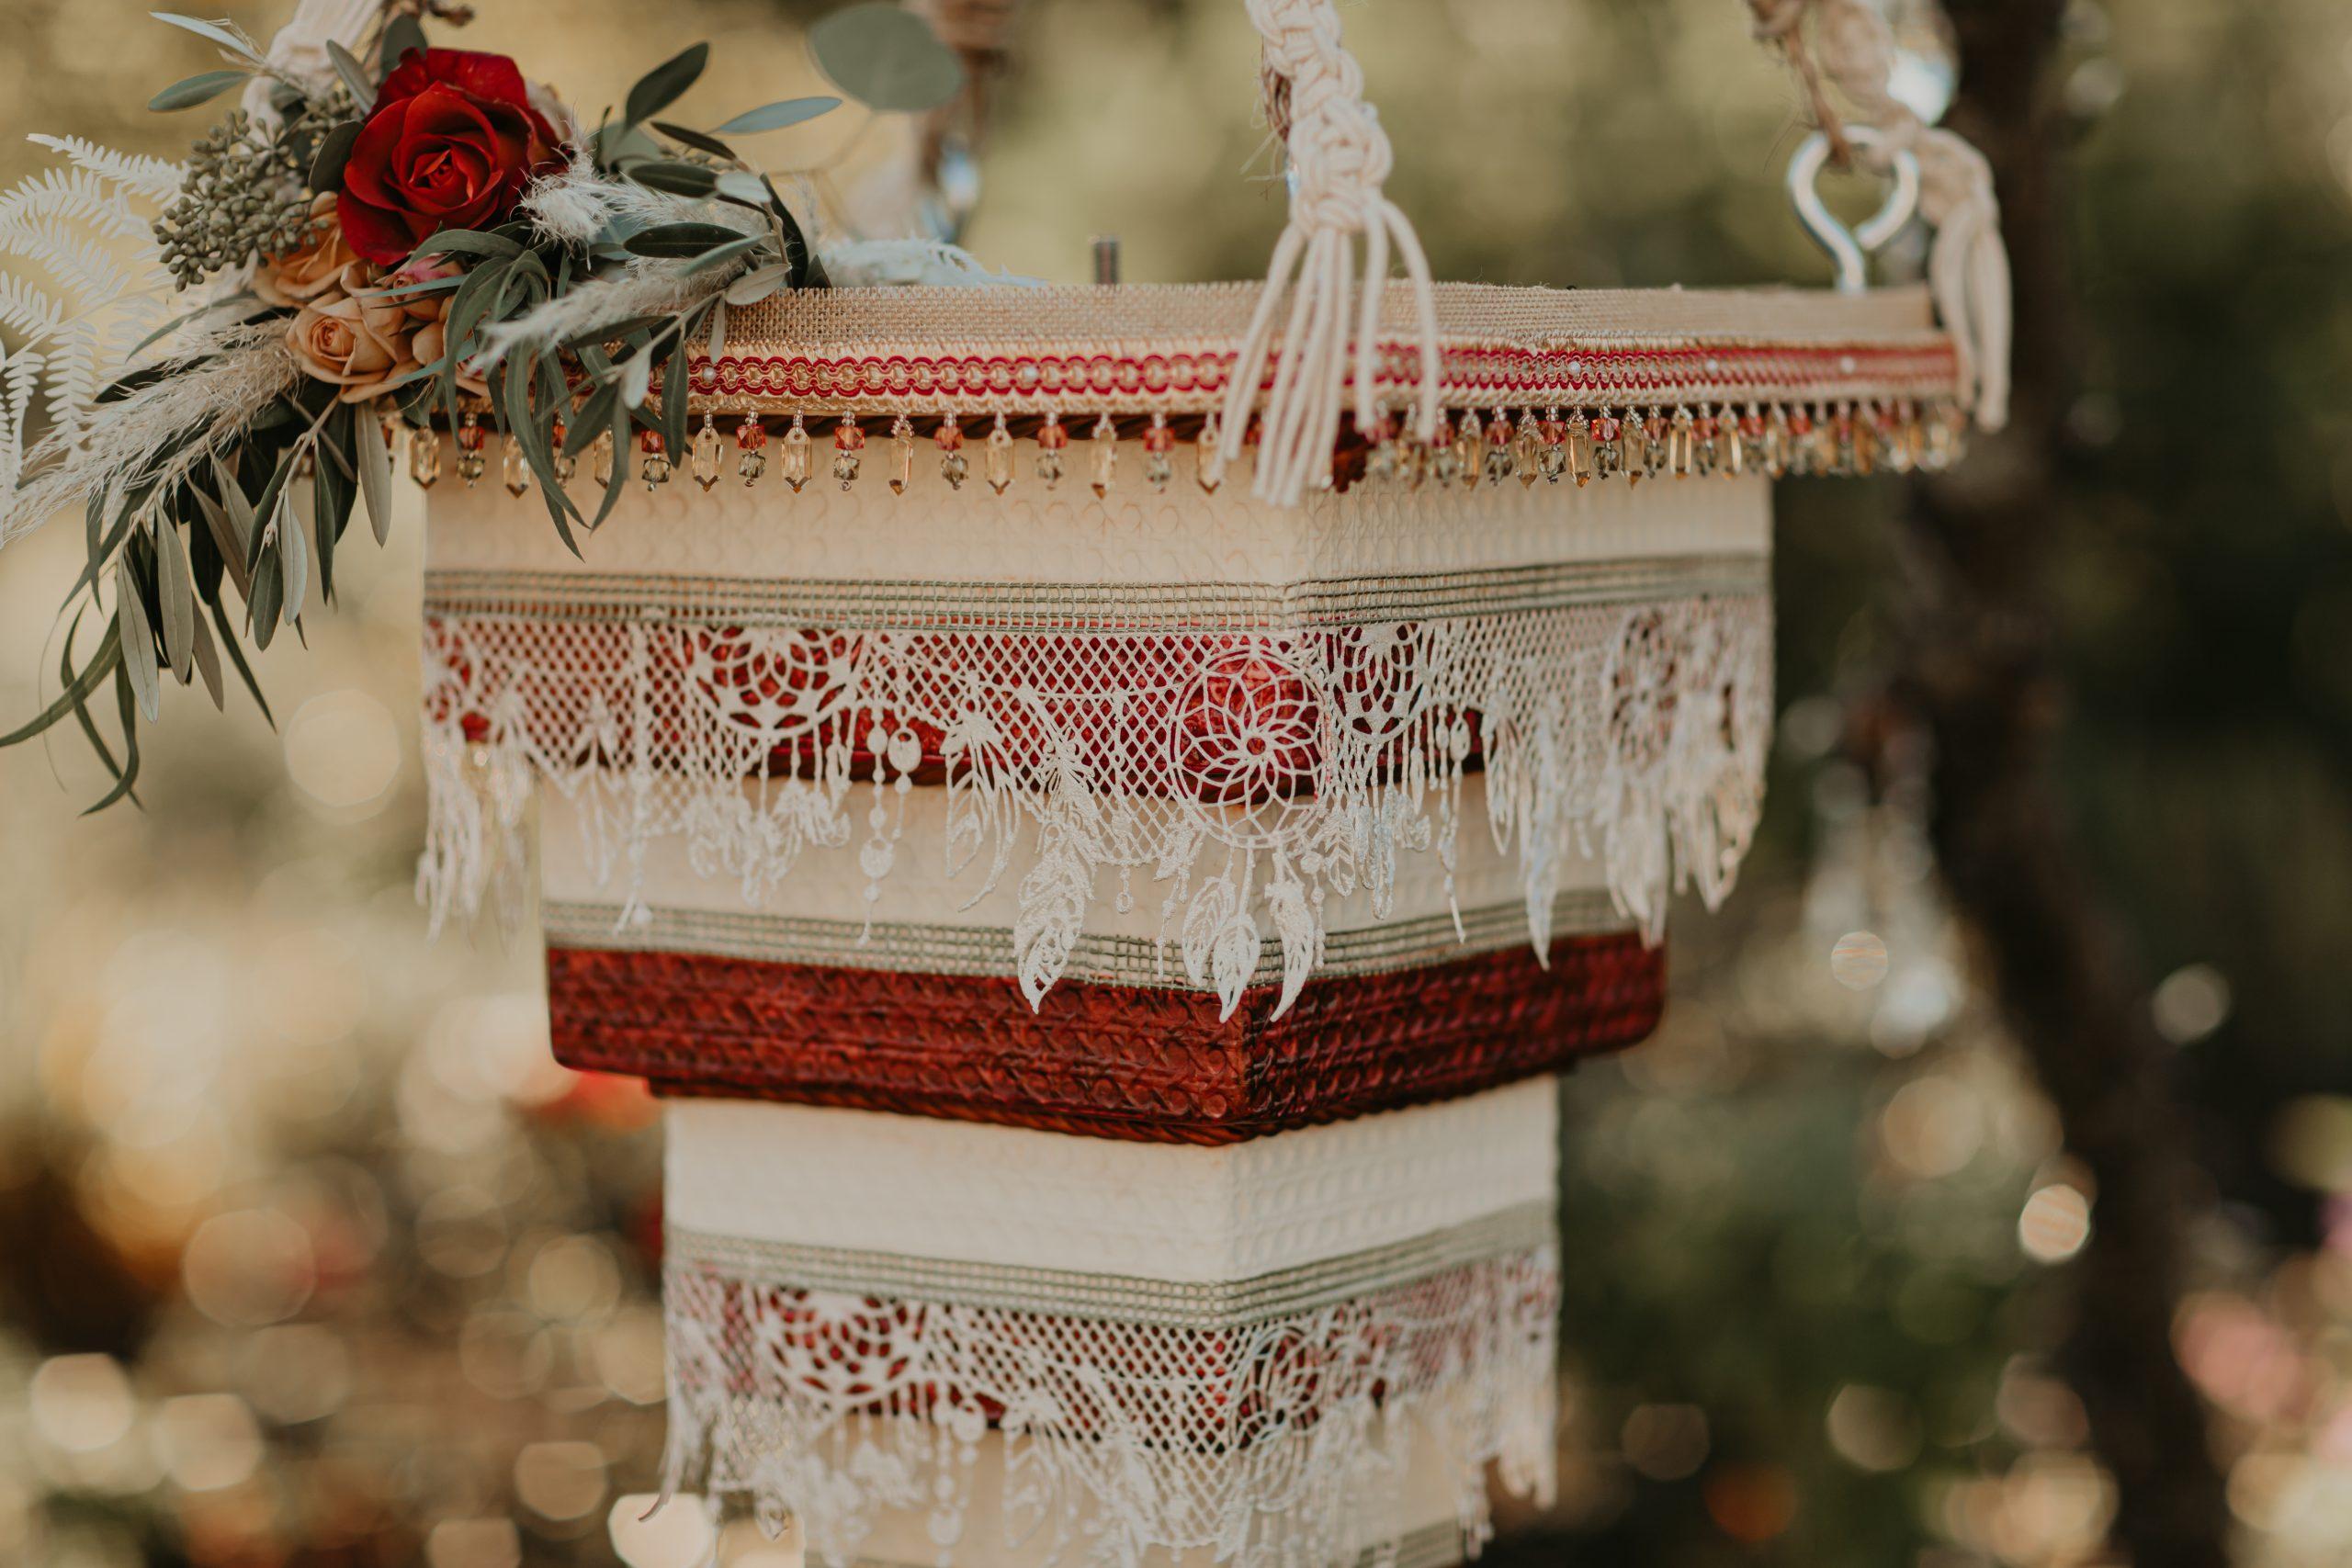 boho wedding cake, upside down wedding cake, cake champions, wedding cake flowers, wedding cake florals, bohemian wedding cake, edible lace